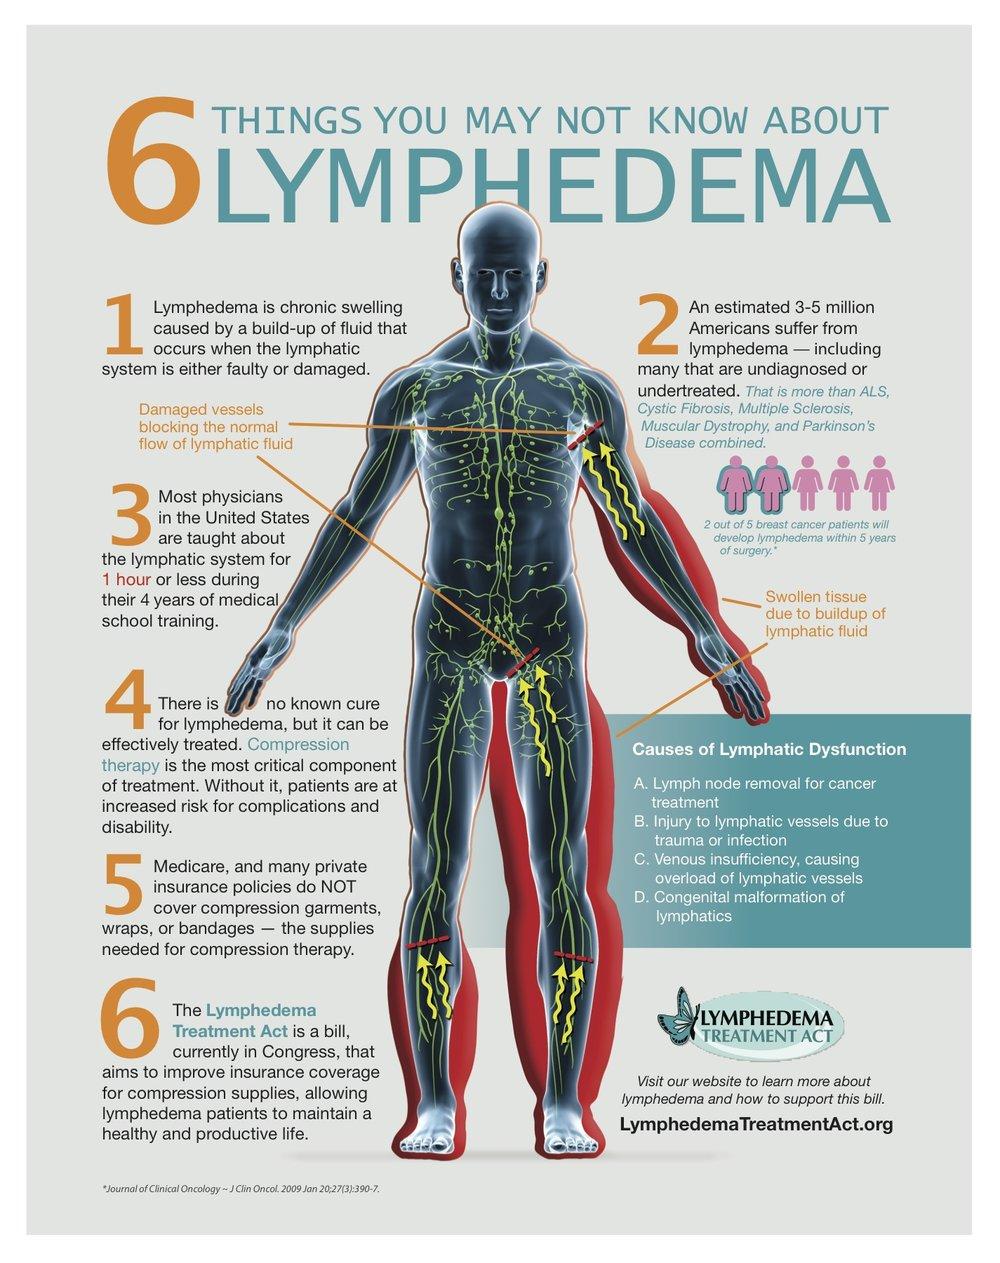 Lymphedema_Infographic_JPG.jpg